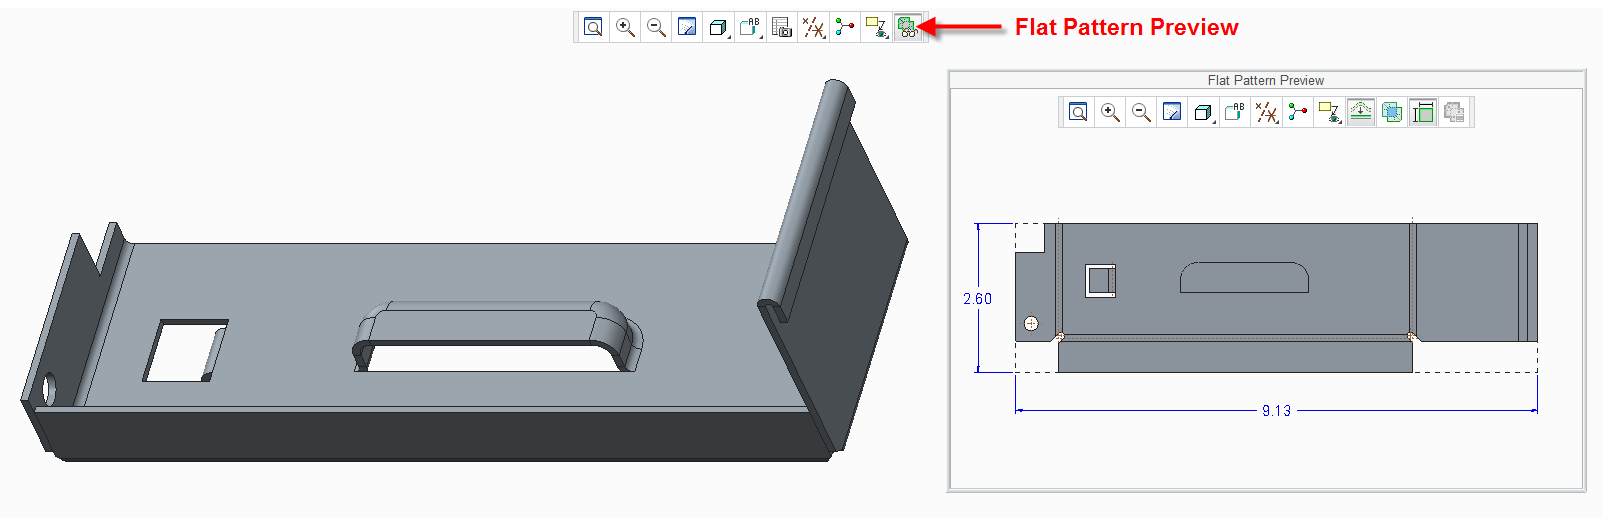 Sheetmetal Flat Pattern Preview Window In Creo Parametric Flats Patterns Pattern Parametric